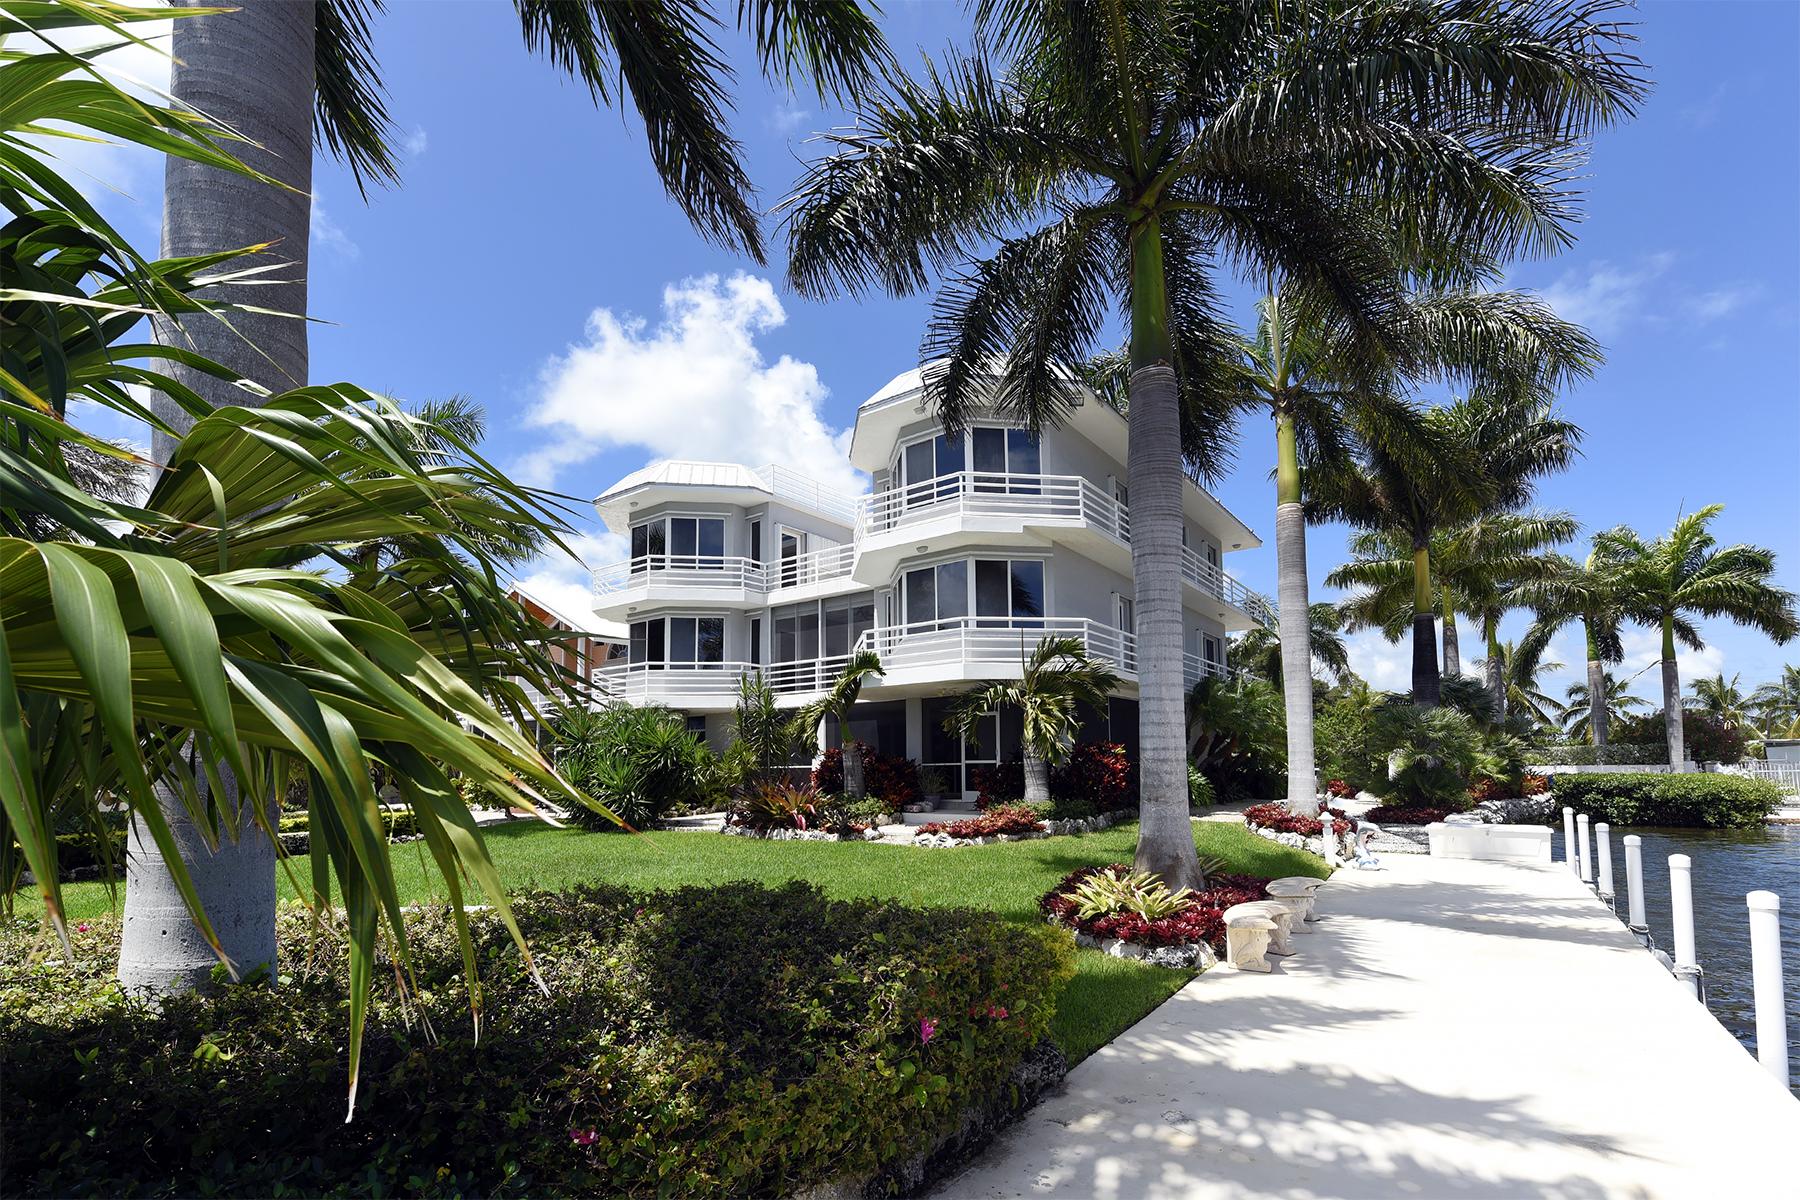 Single Family Home for Sale at Grand Bayfront Estate 569 Hazel Street Key Largo, Florida, 33037 United States